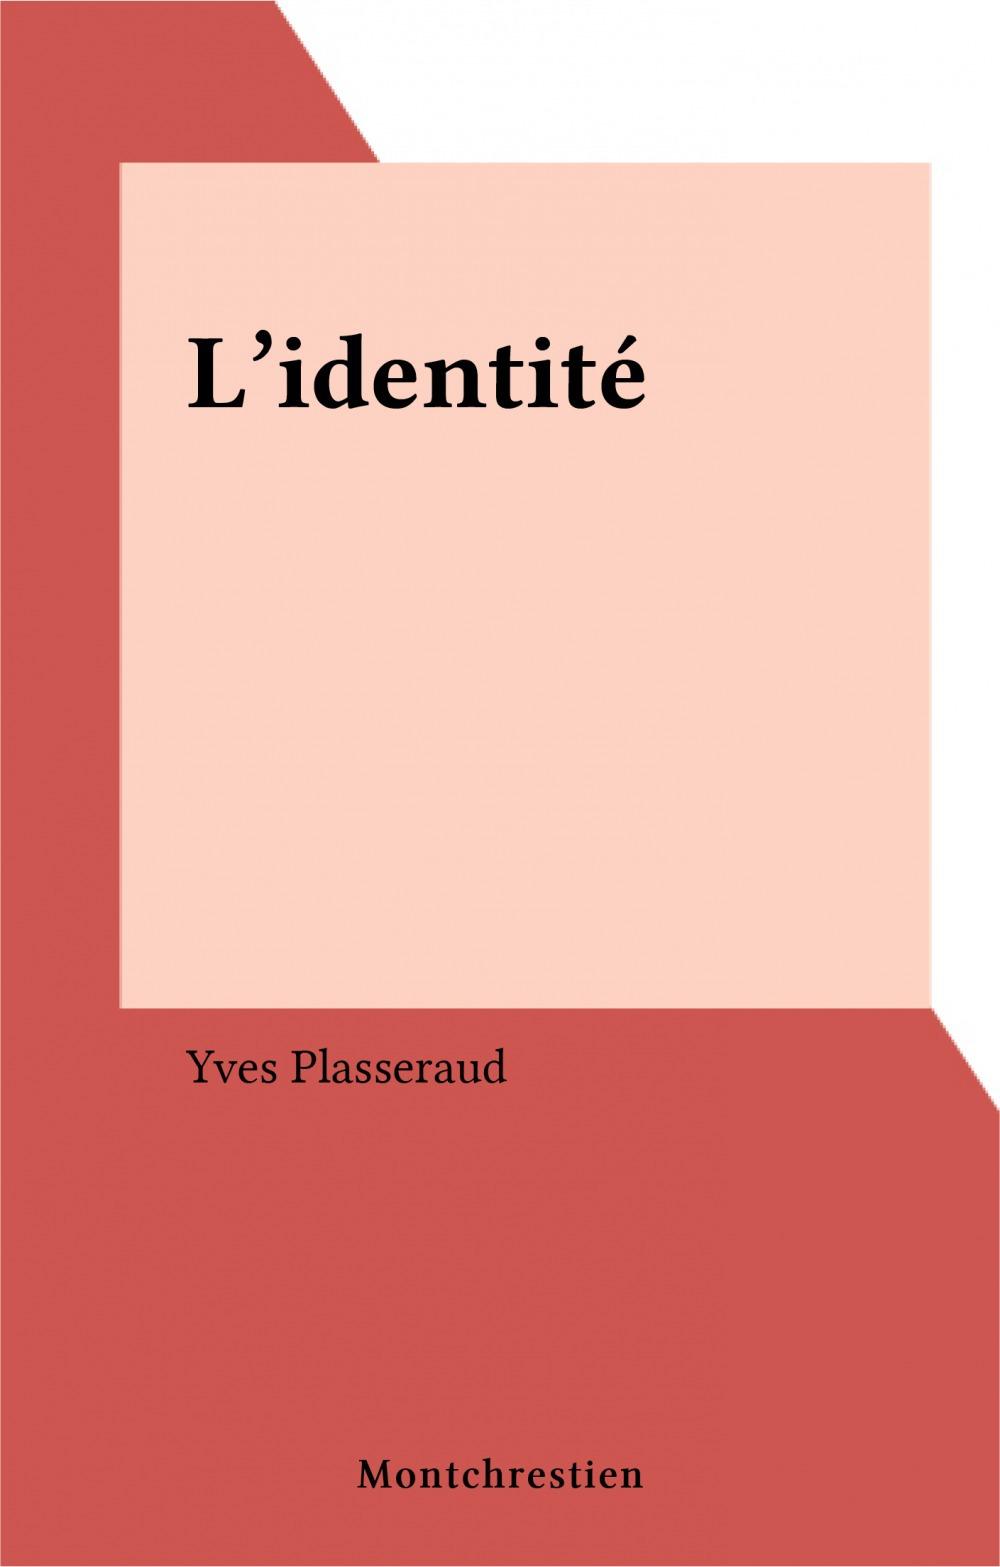 Identite (l')